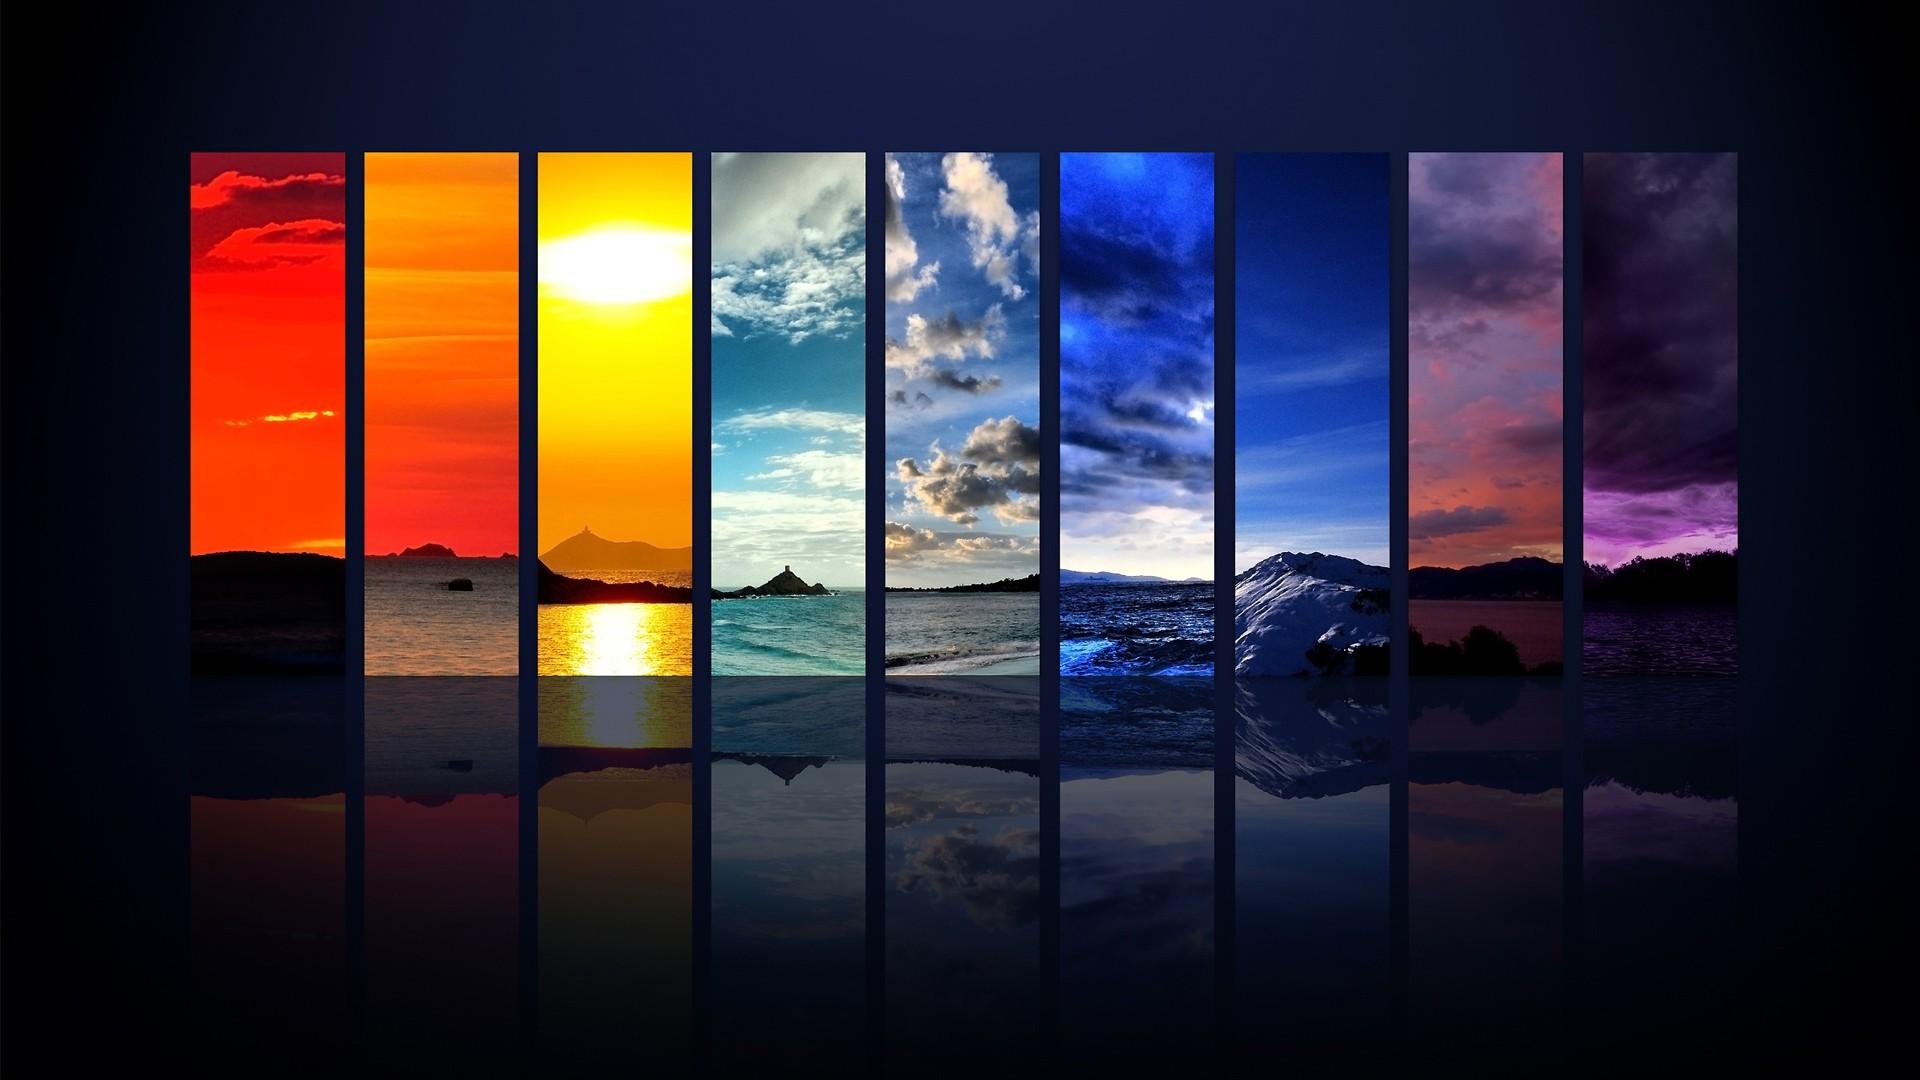 desktop background hd download free amazing full hd wallpapers